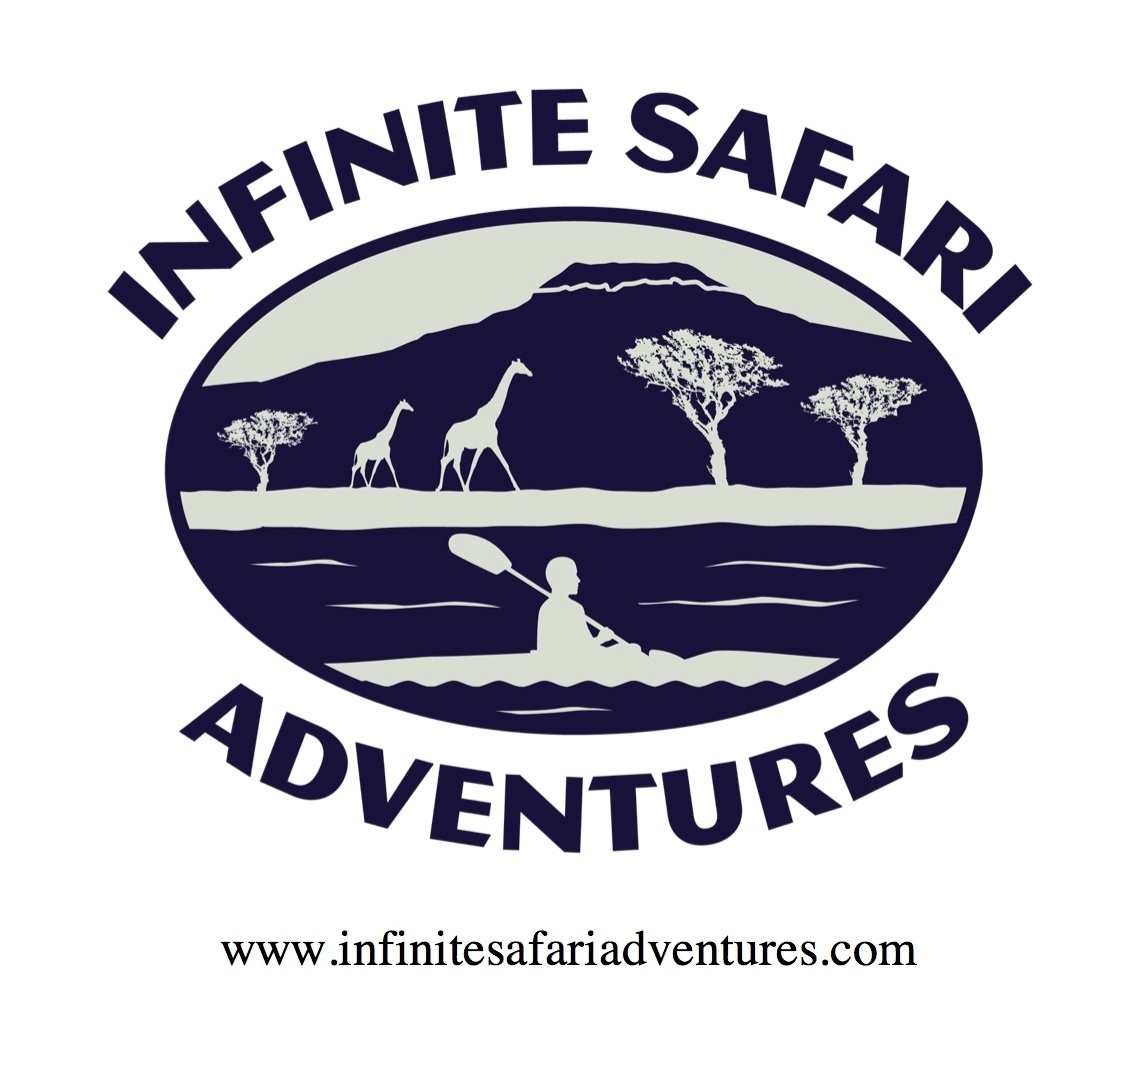 Infinite Safari Adventures image 1